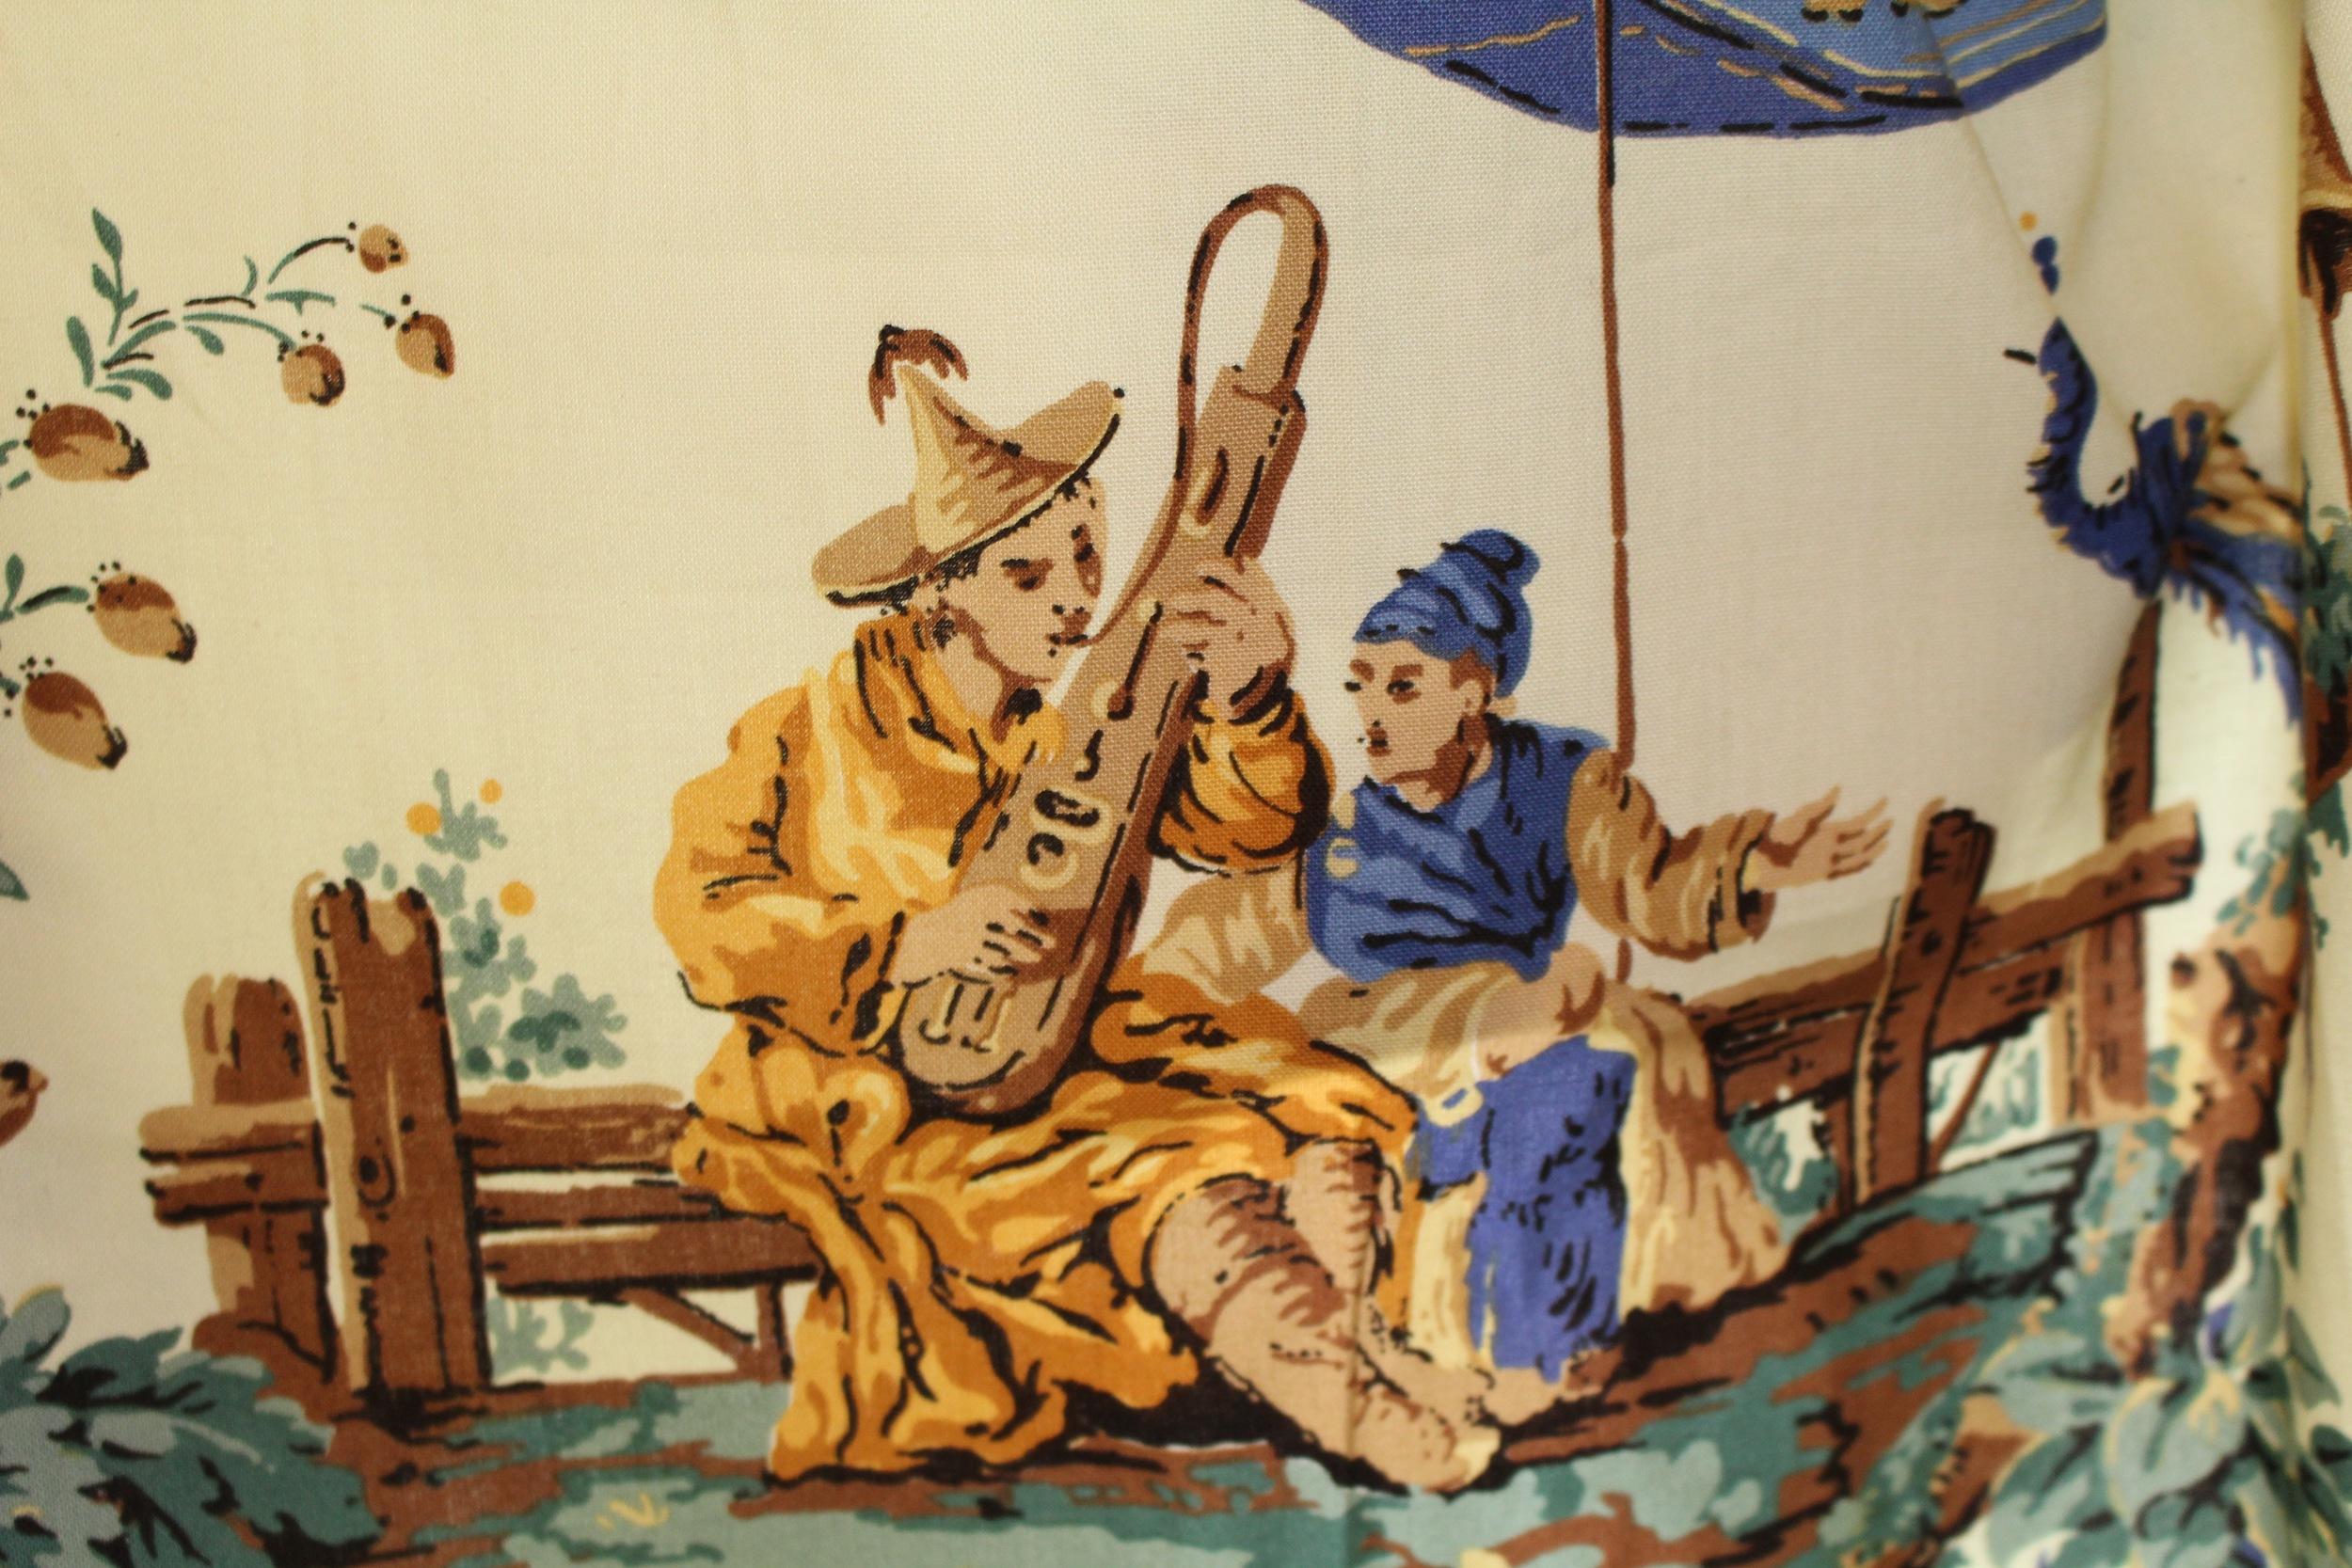 Zoffany, The Emperor's Musician, Yellow Colourway